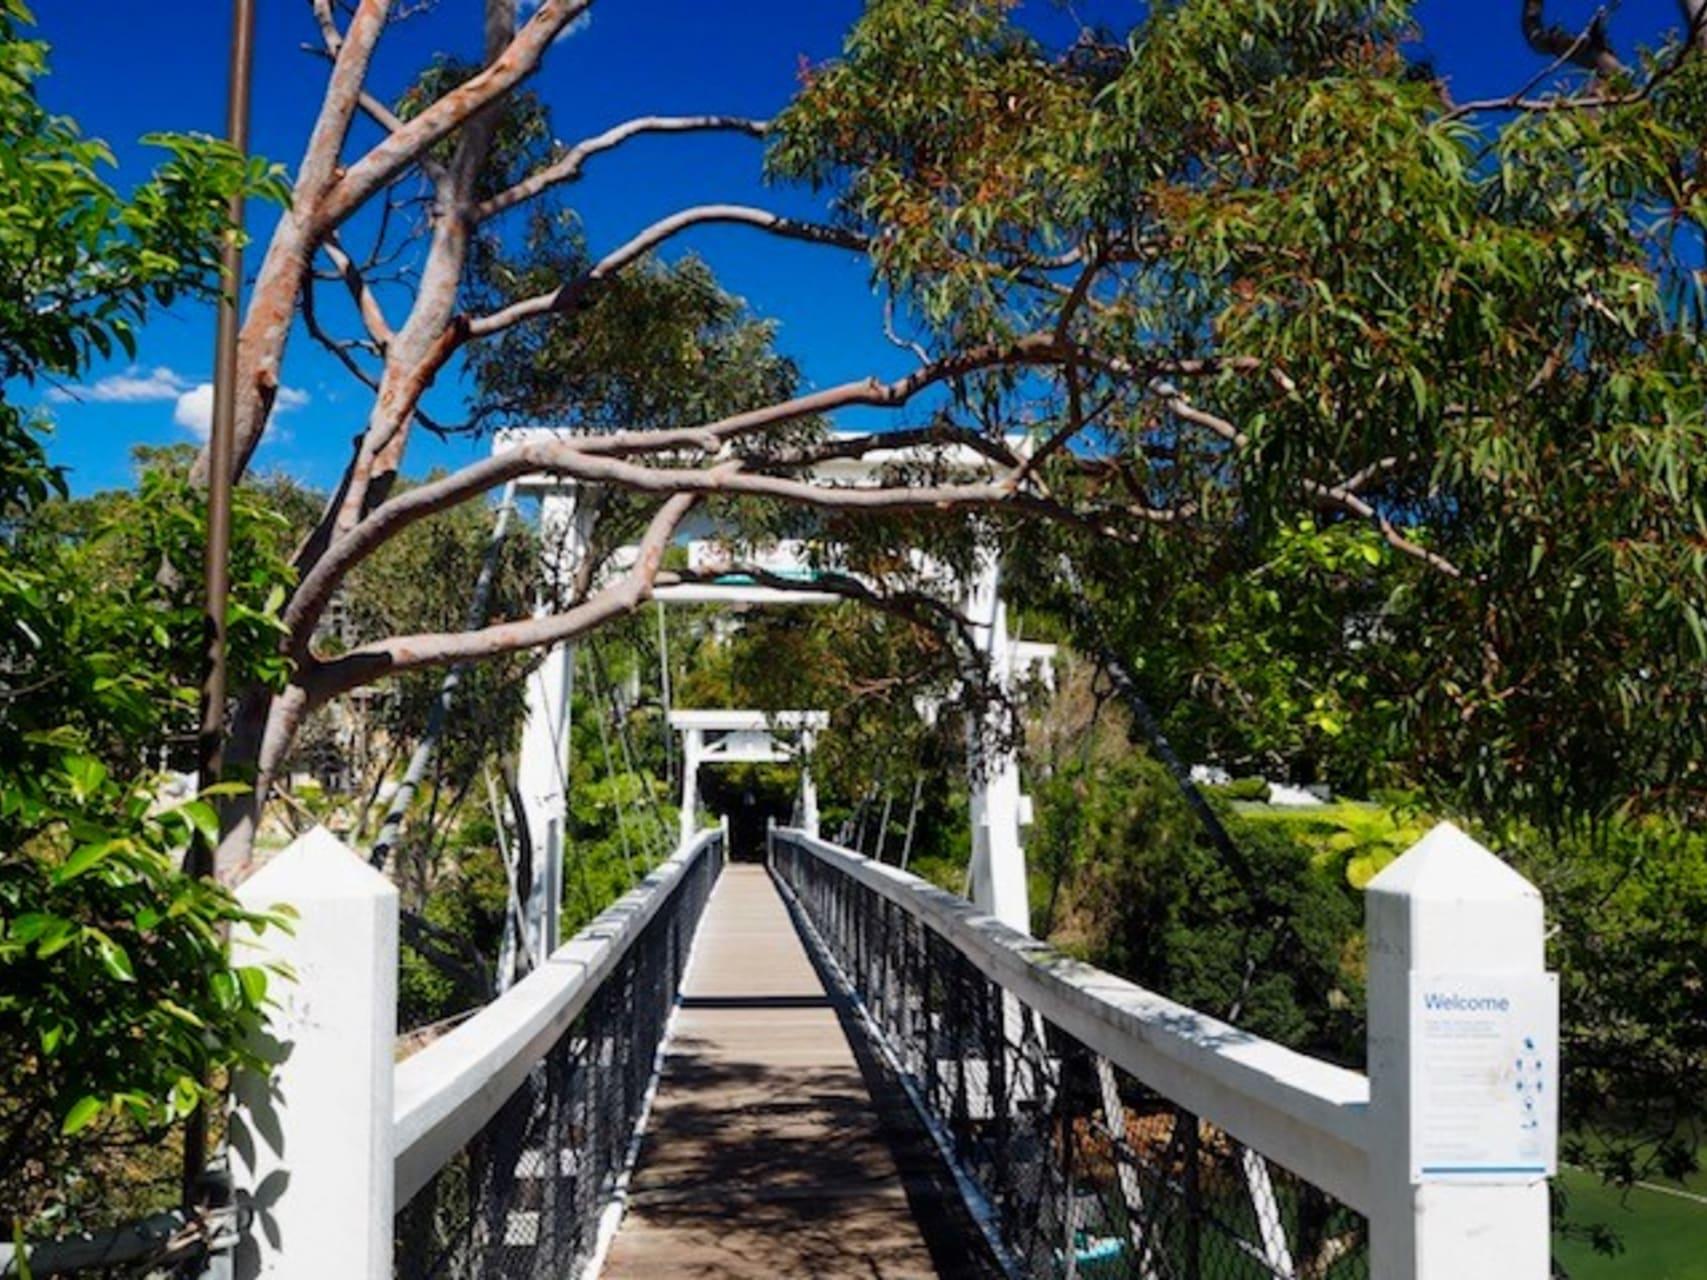 Sydney - Bondi to Manly Sydney Coastal Walk – 45 minutes at a time